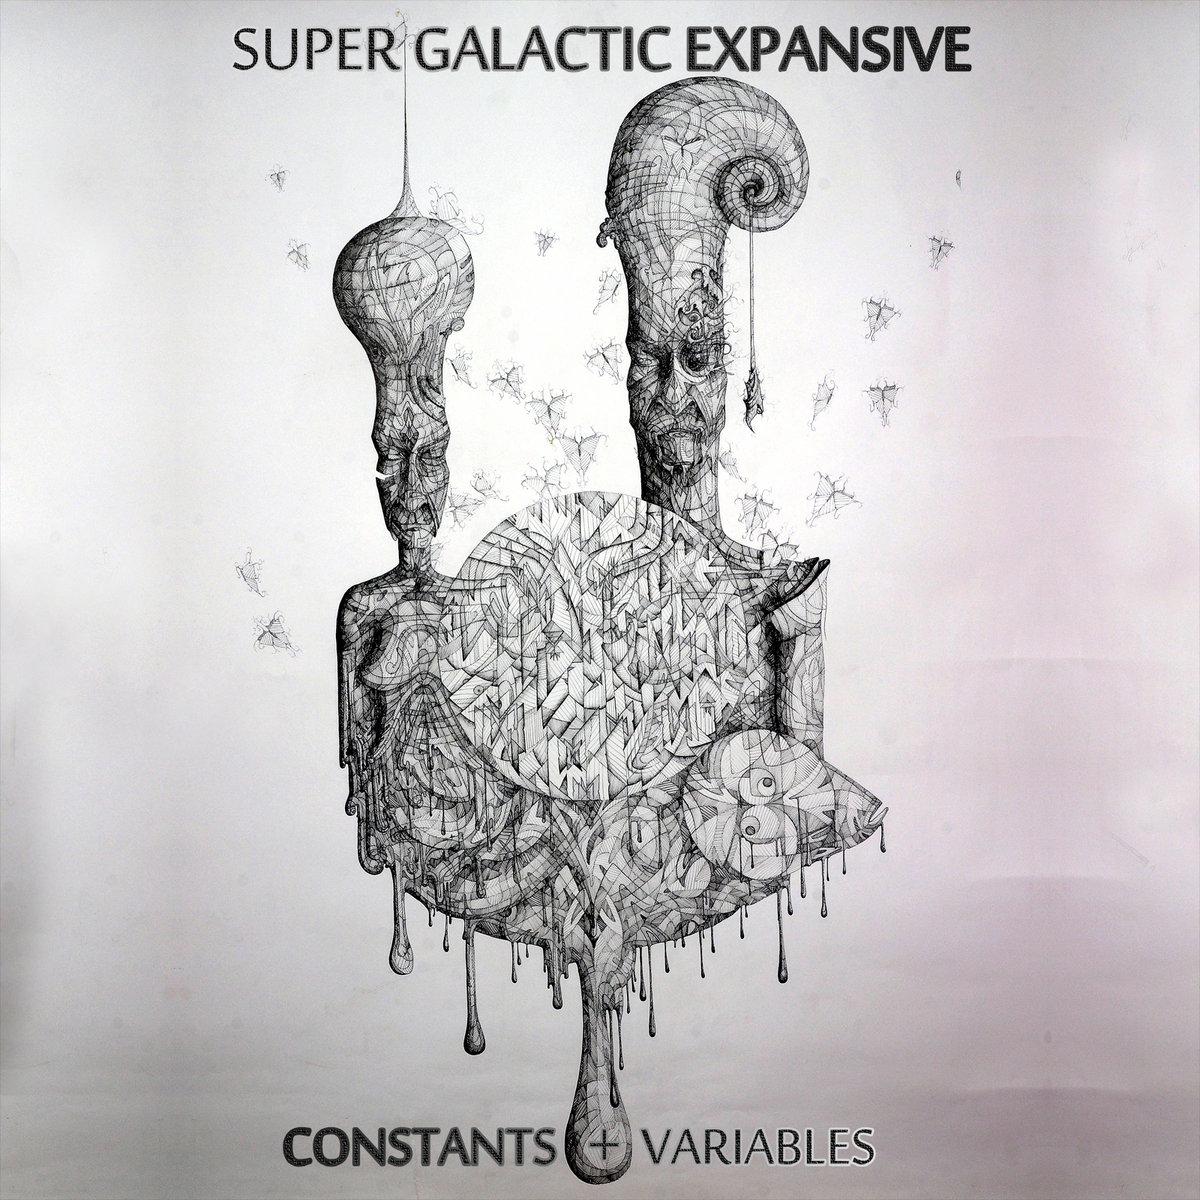 Constants & Variables | Super Galactic Expansive